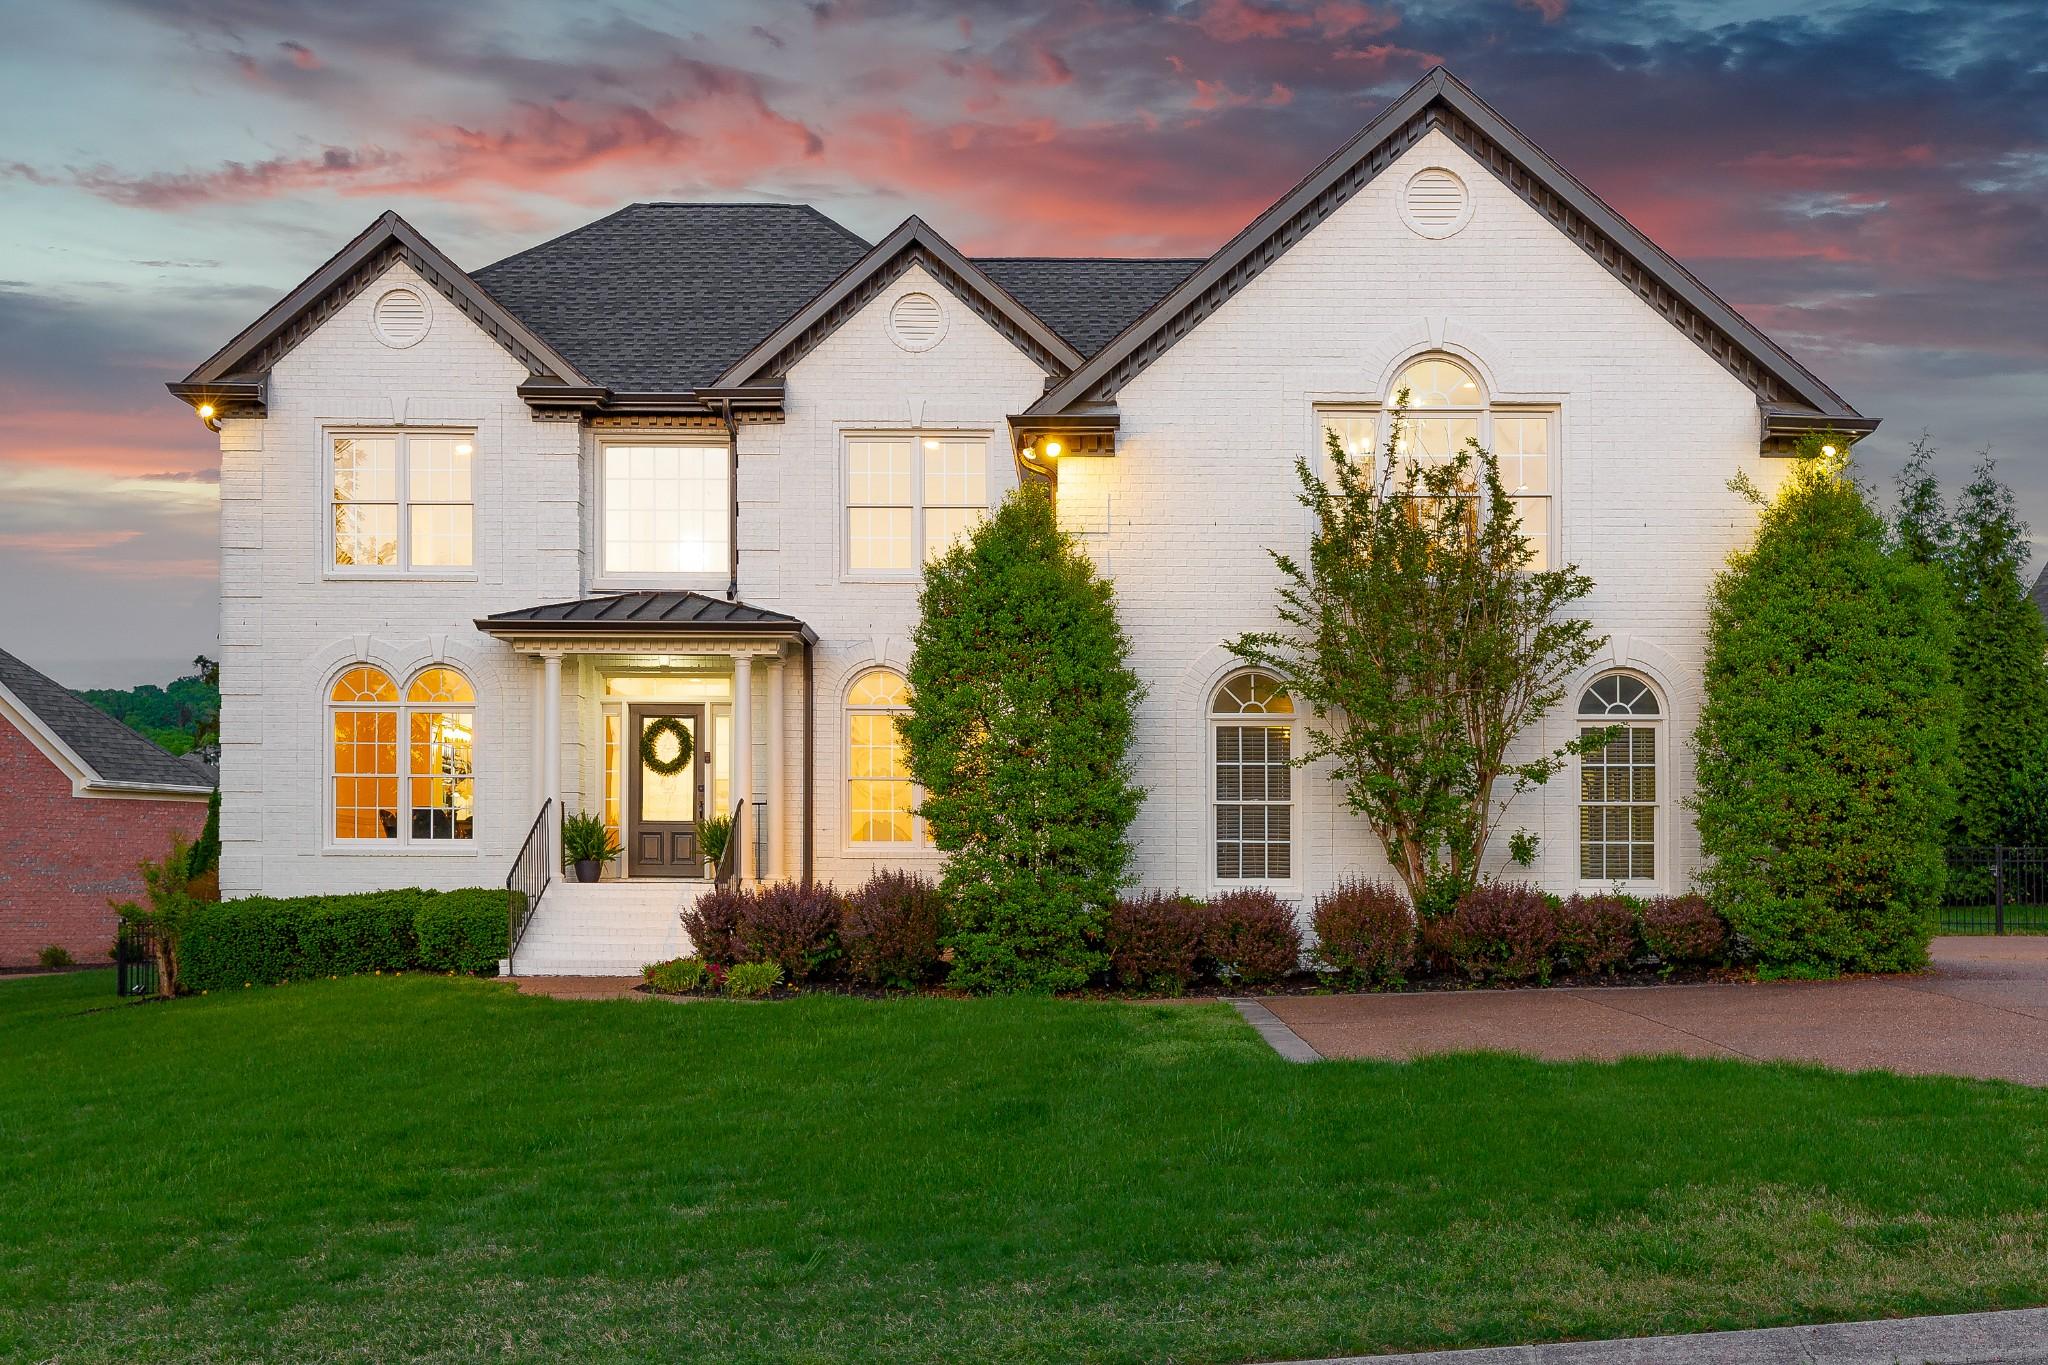 231 Gardenridge Dr Property Photo - Franklin, TN real estate listing